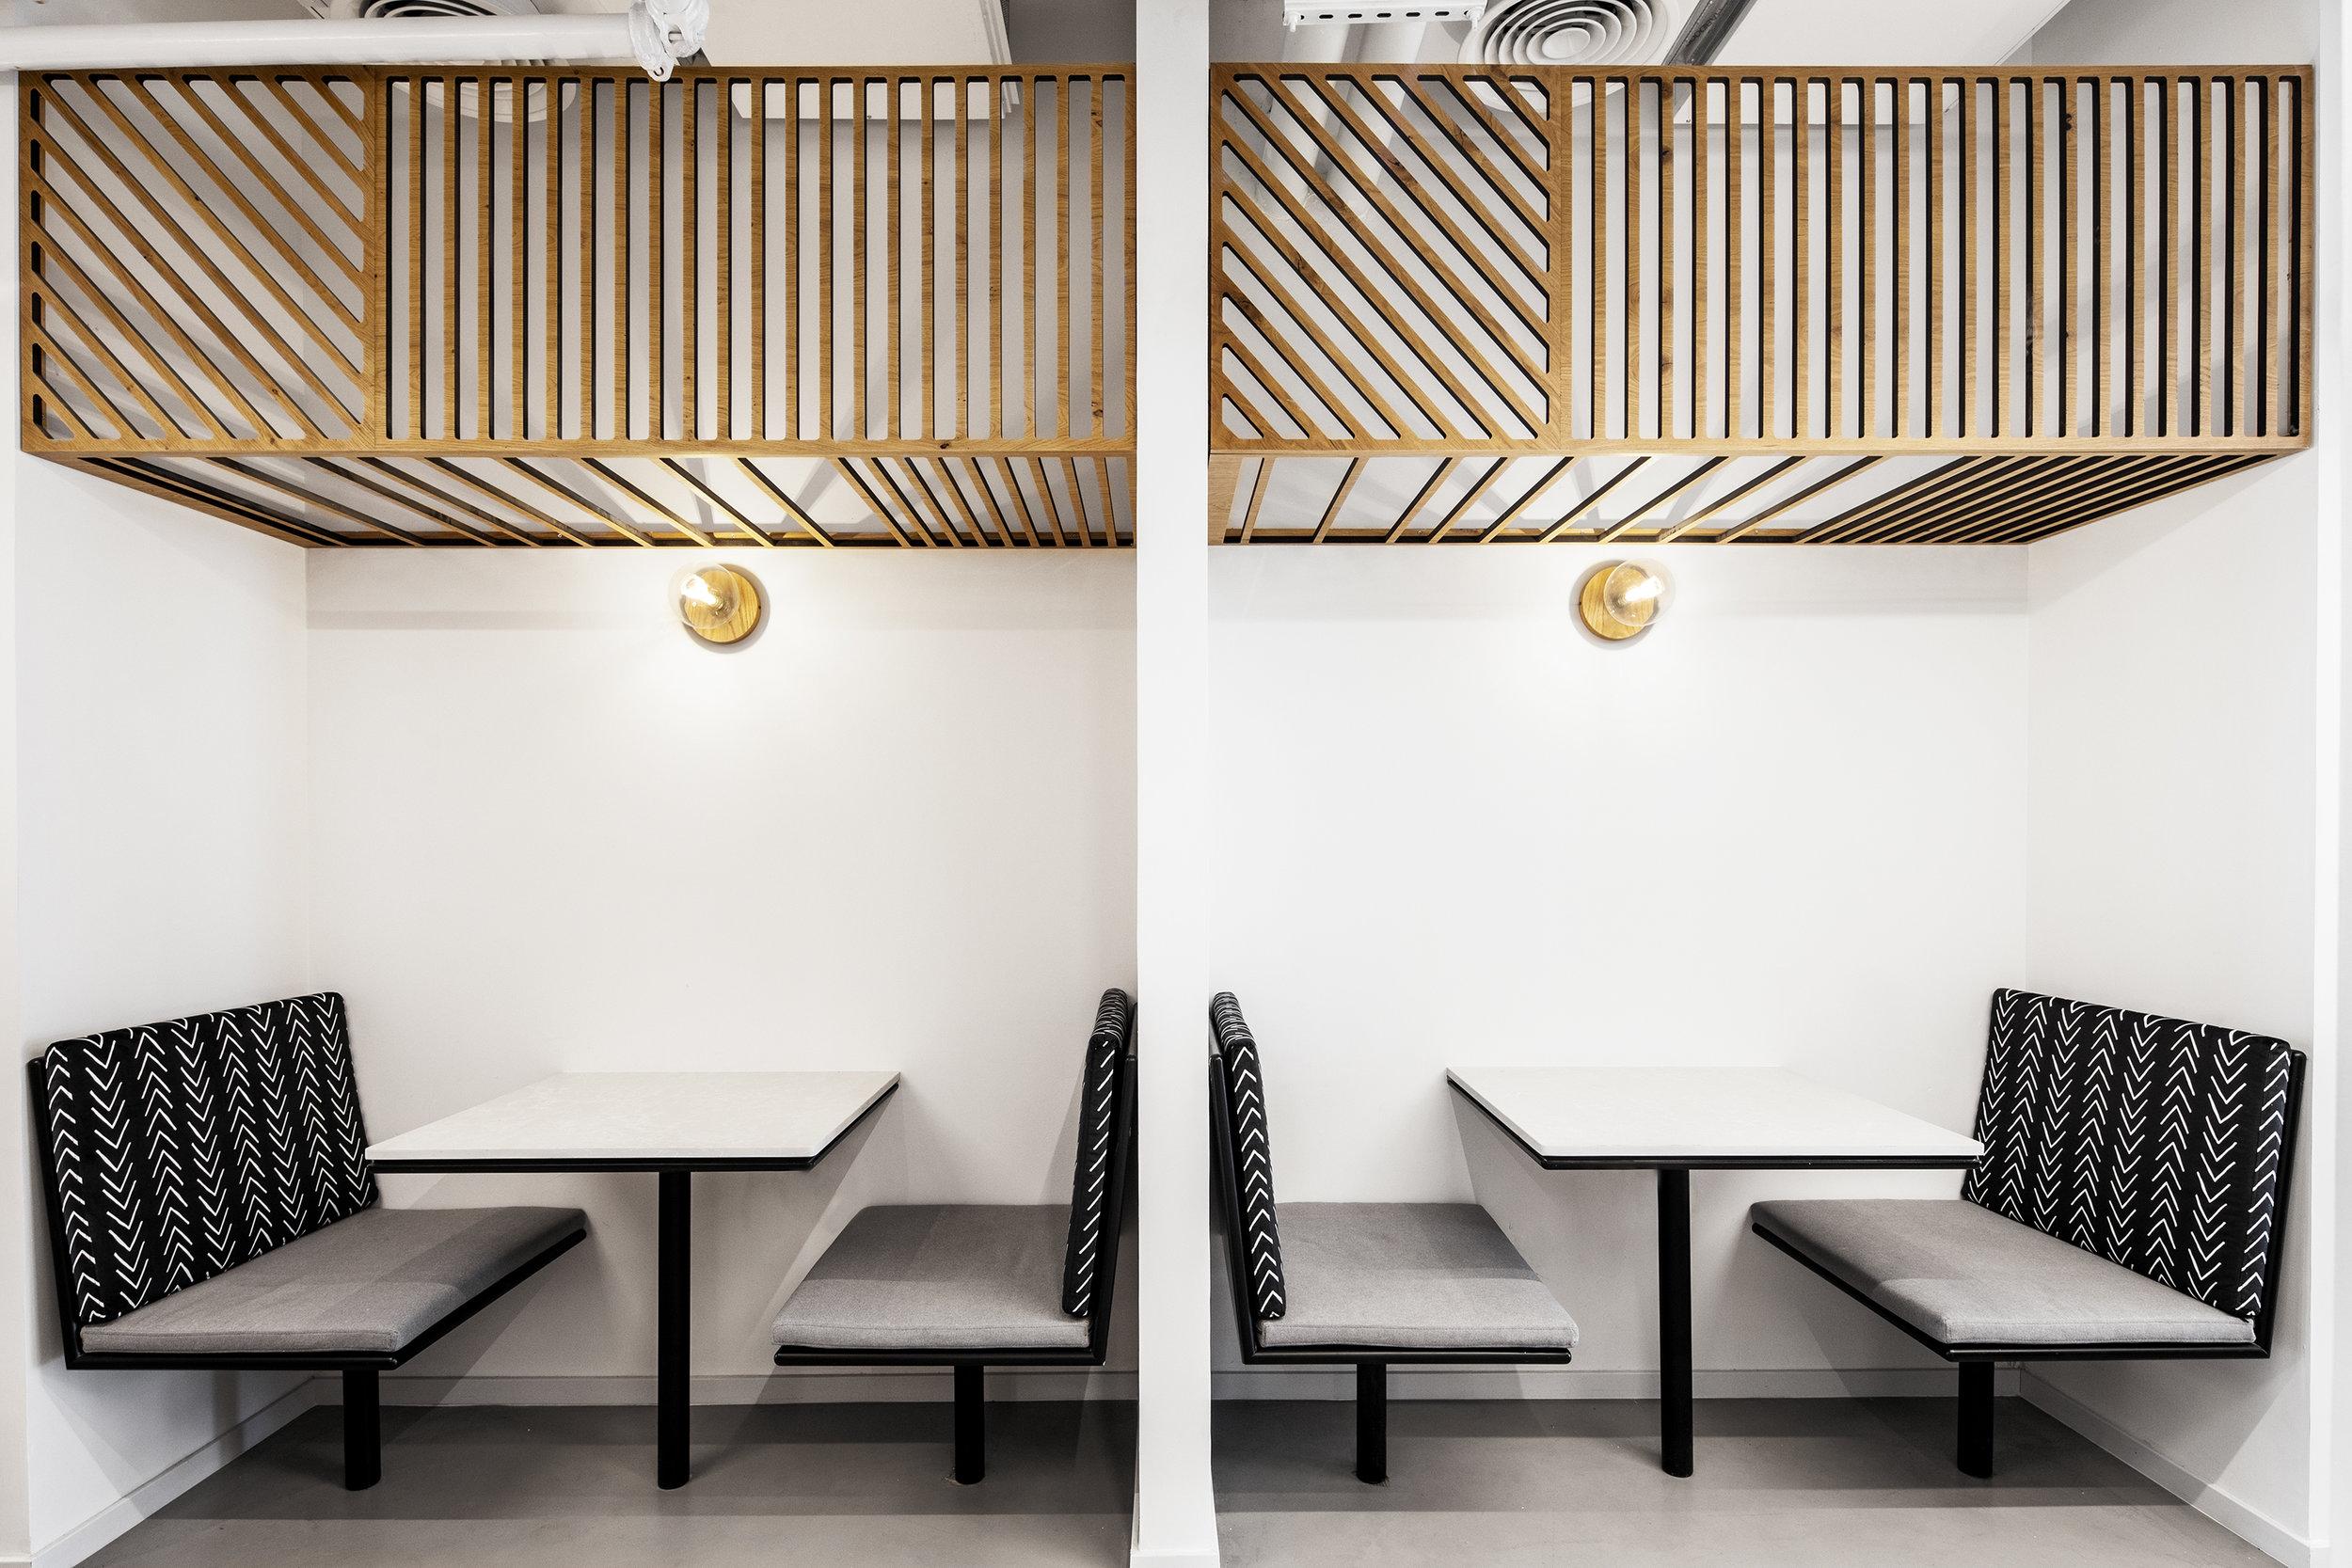 R2NET OFFICES - ROY DAVID ARCHITECTURE  STUDIO - רואי דוד אדריכלות סטודיו אדריכלים - אר2נט (22).jpg